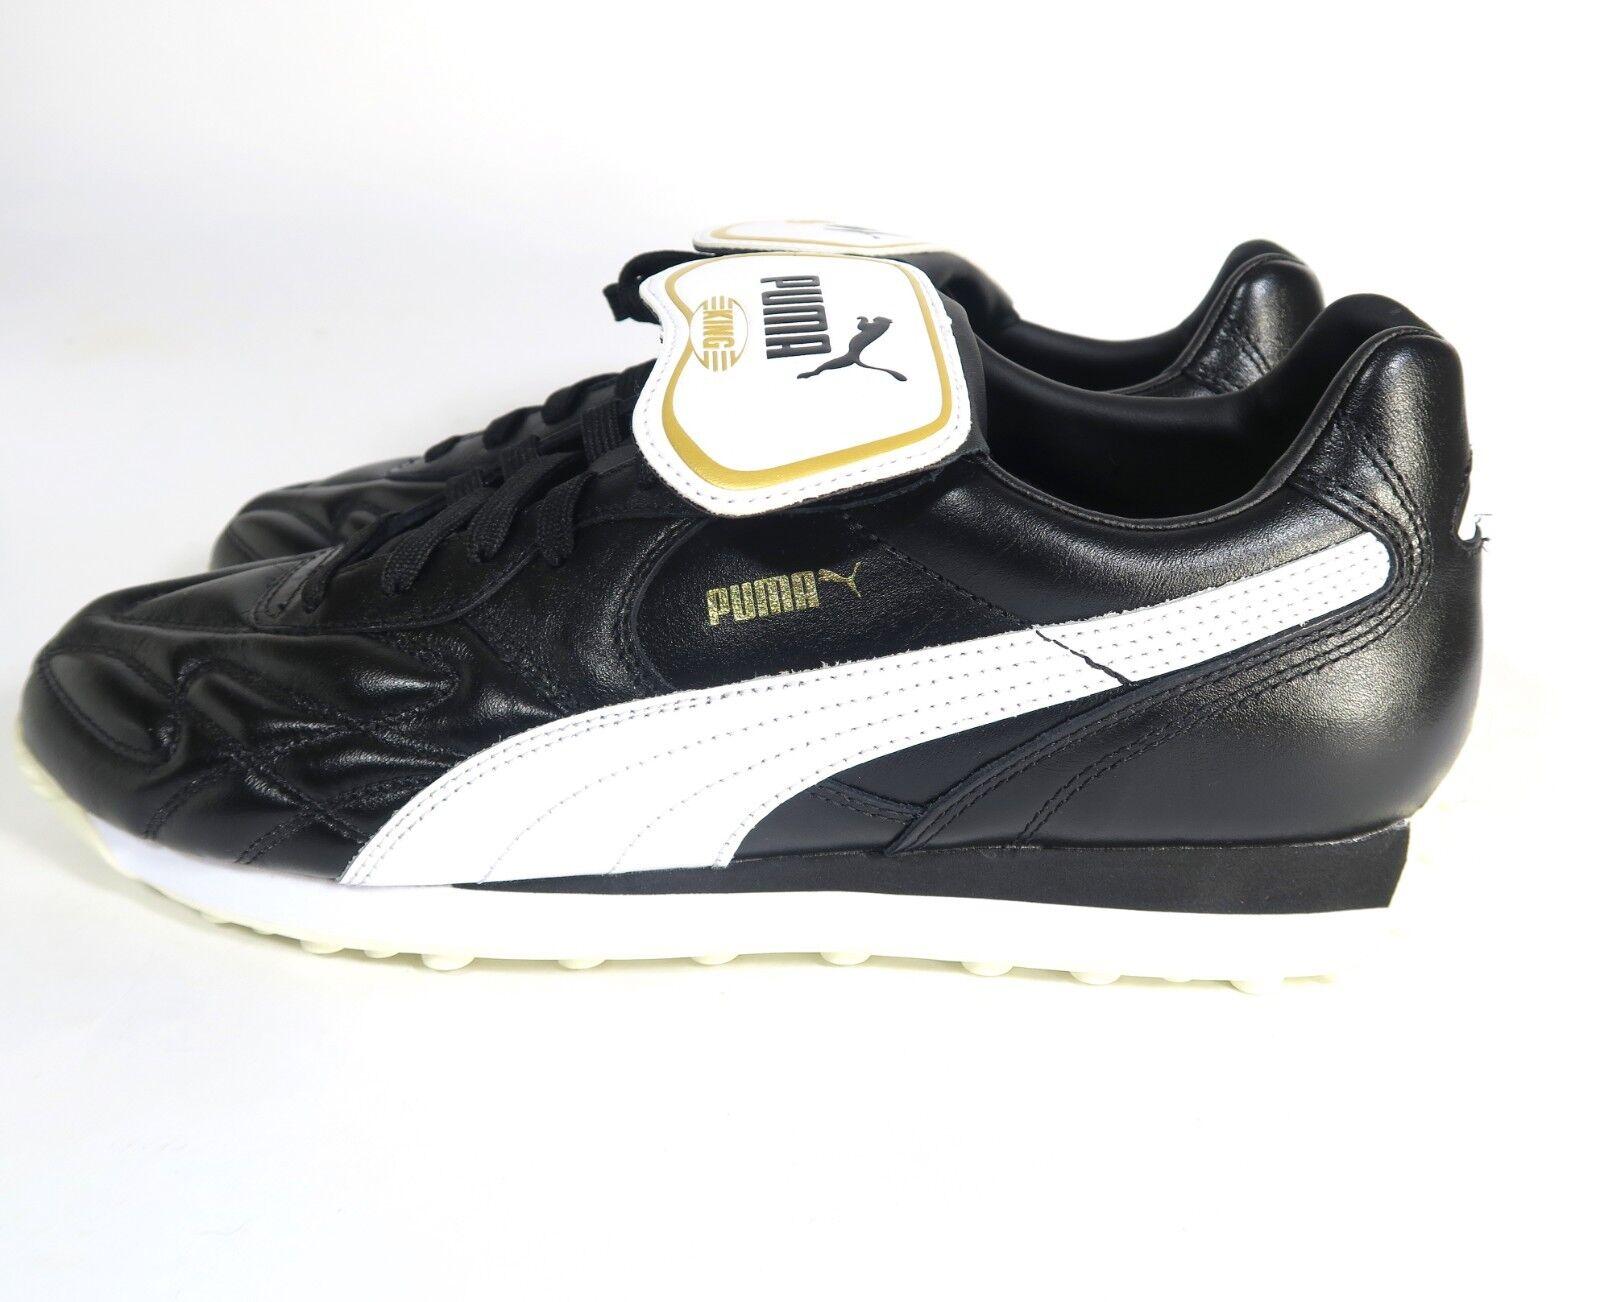 Puma King Avanti Men's shoes Soft Leather Casual 365482-01 Size 10.5